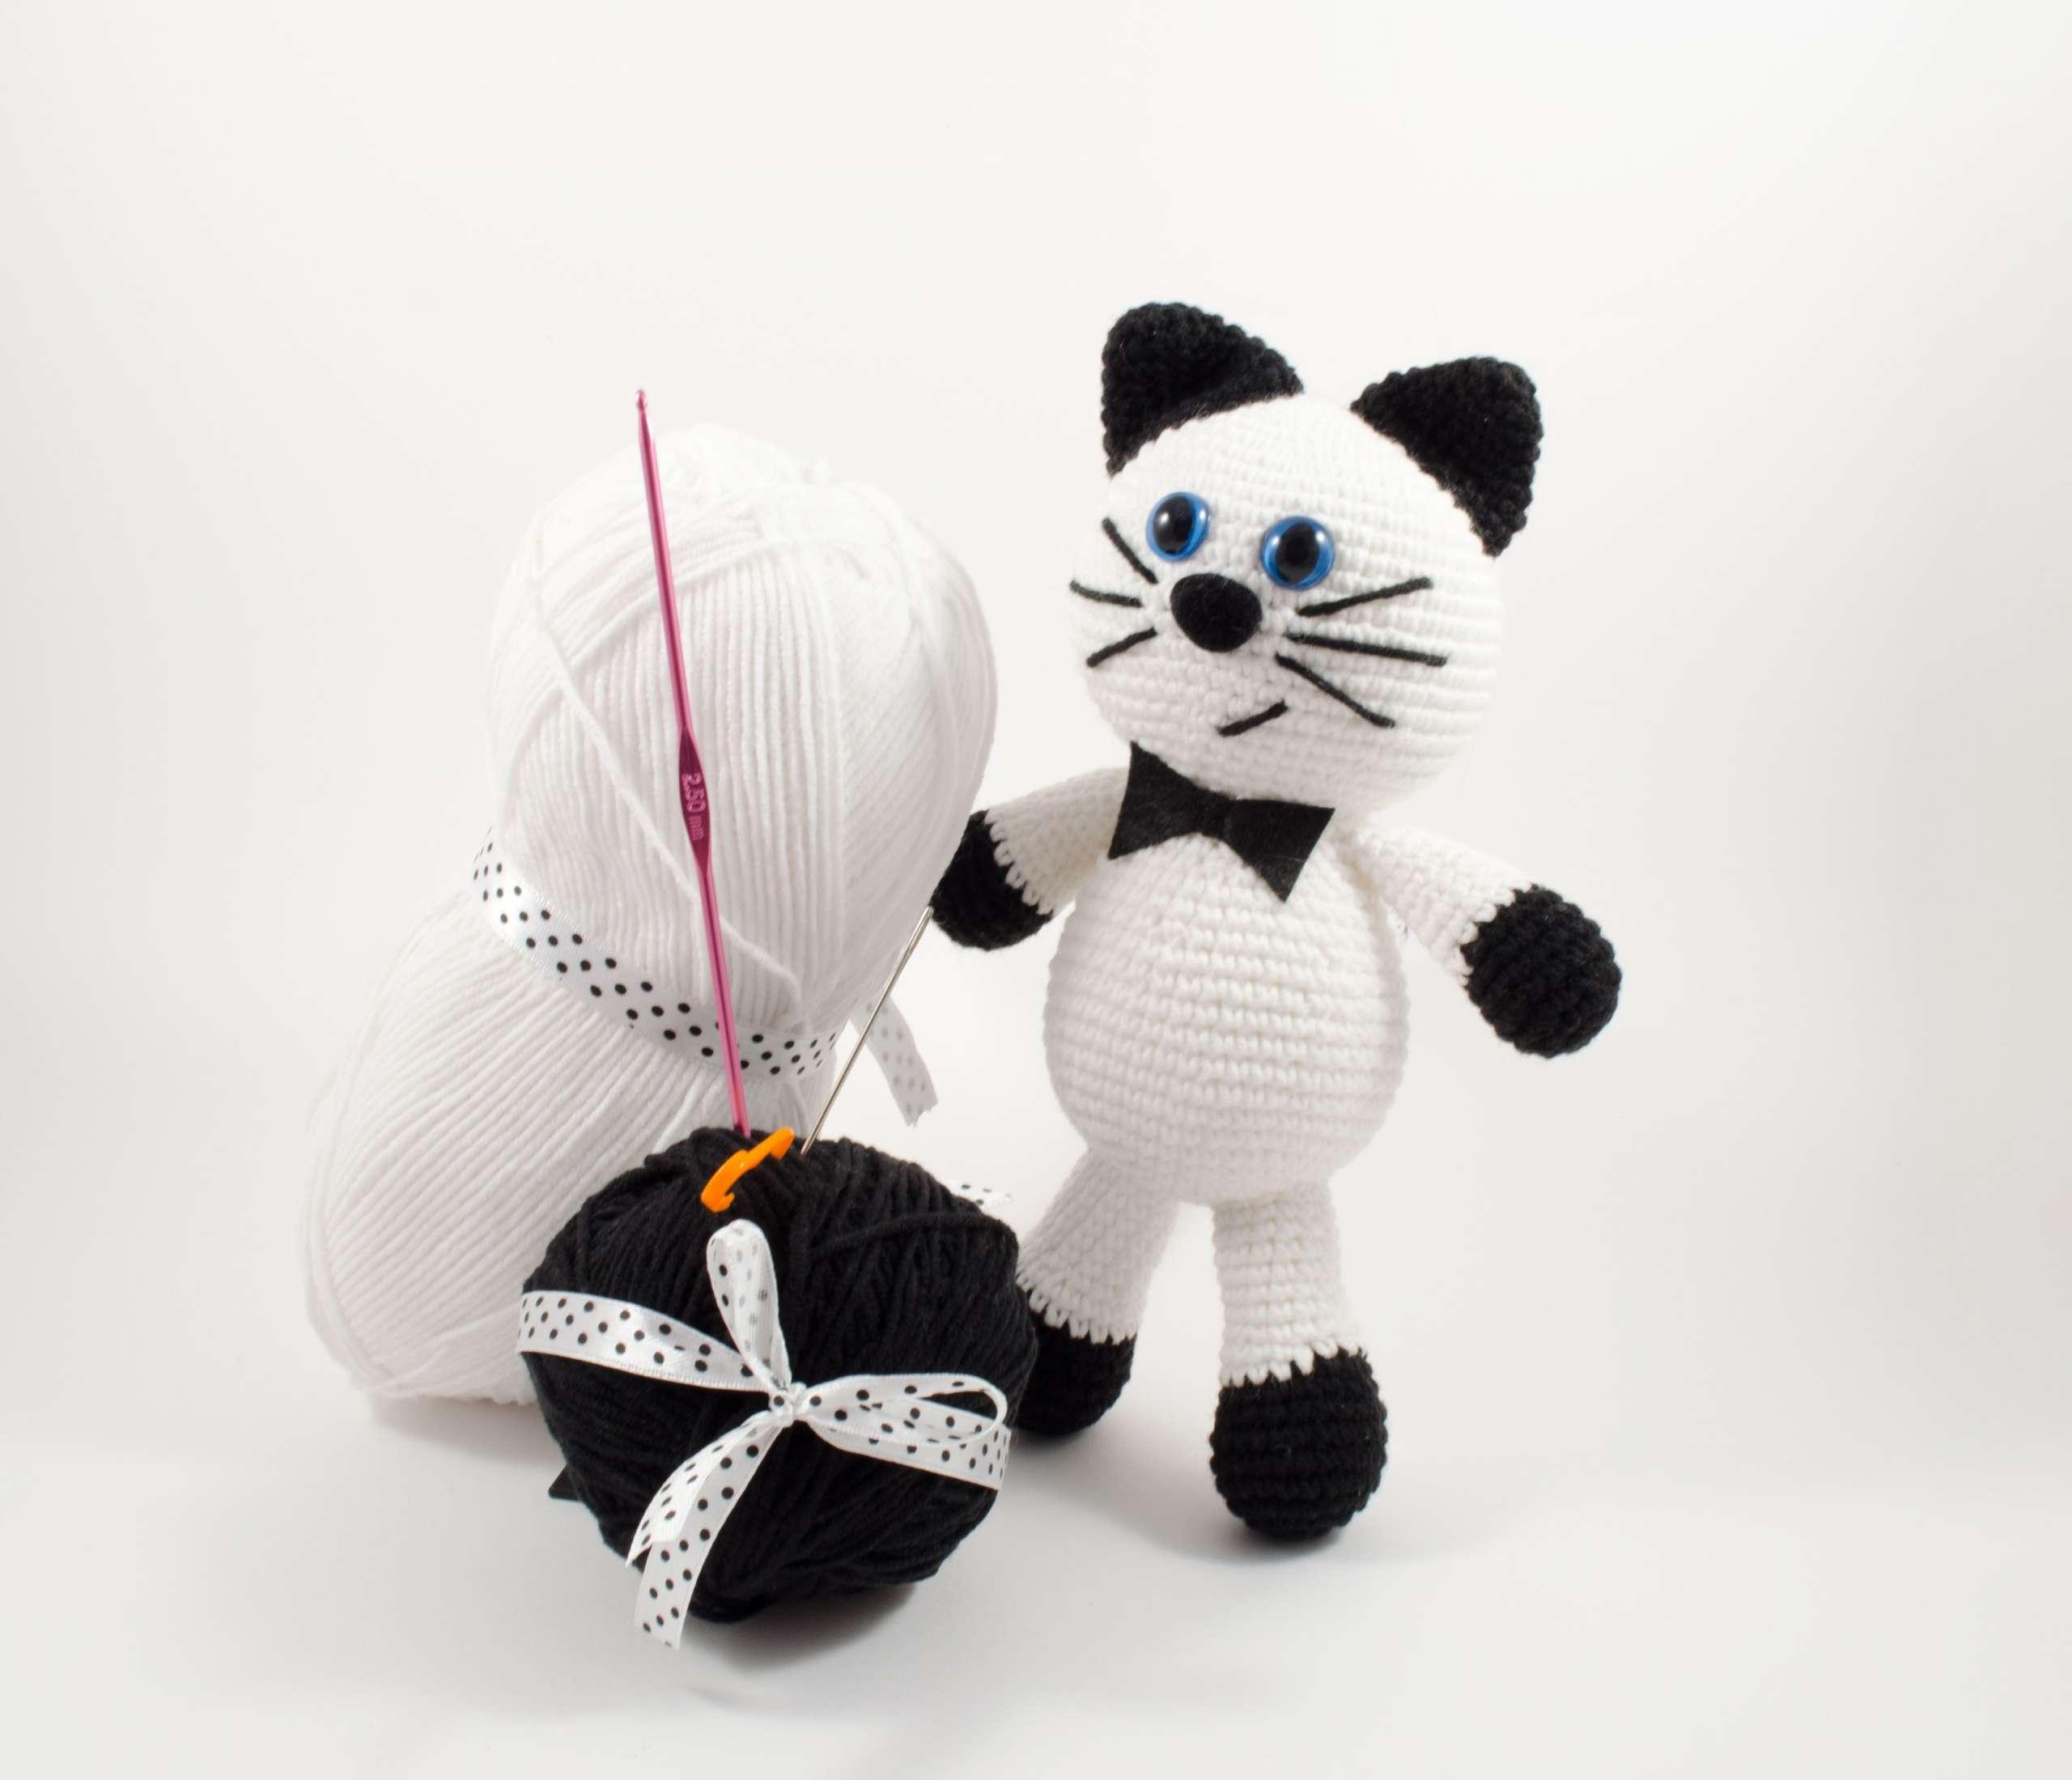 crochet white cat front view